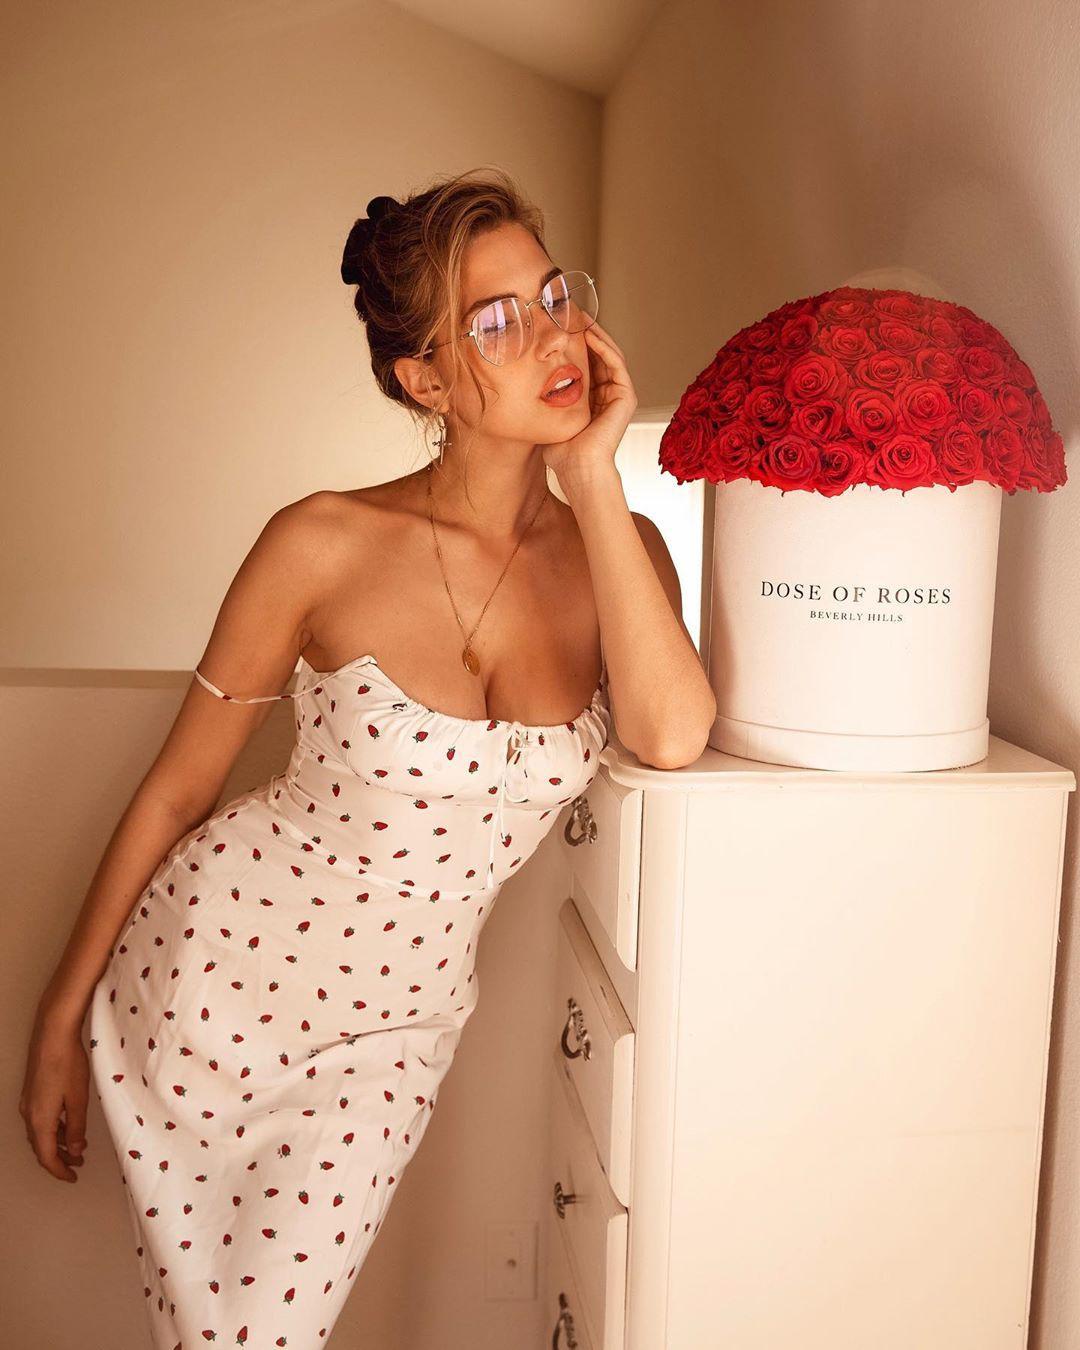 Kara Del Toro dress lookbook dress, hot girls photoshoot, girls instagram photos